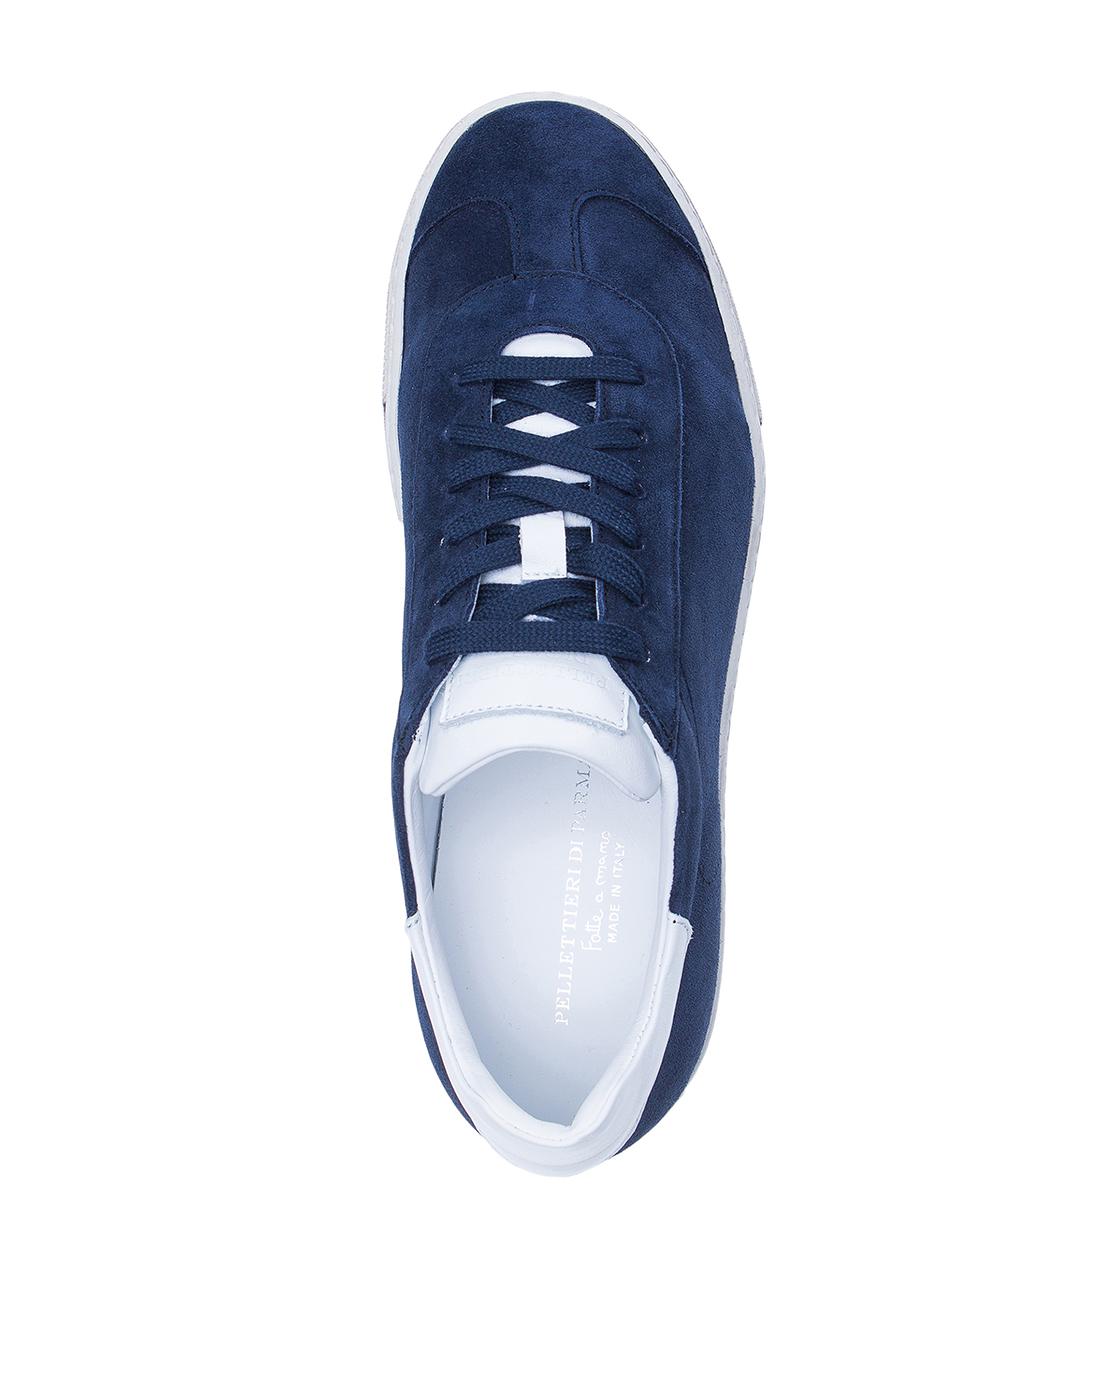 Кеды синие мужские  Pellettieri Di Parma S515060.247.152-5